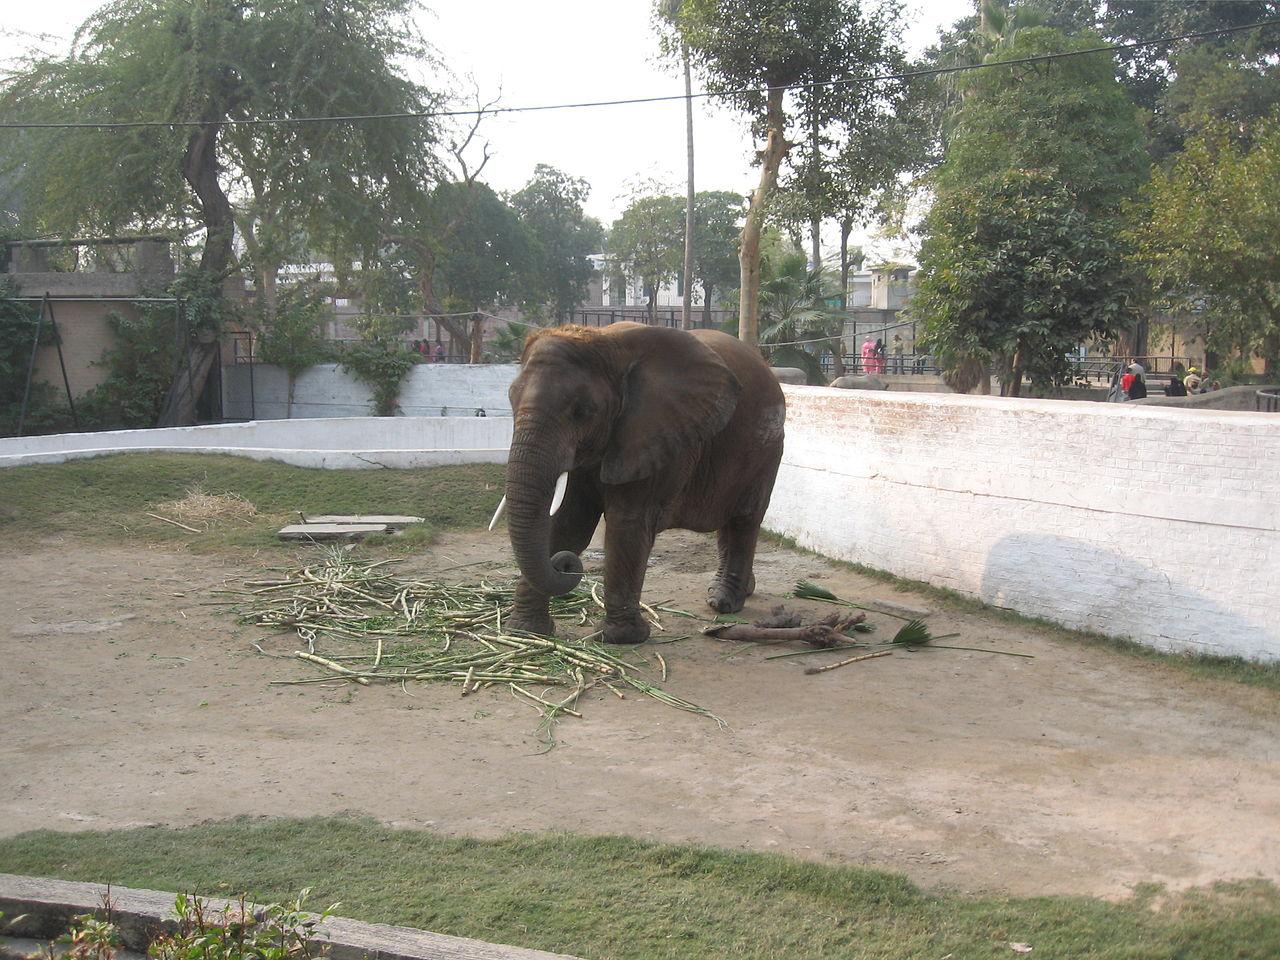 FileElephant Lahore Zoo Pakistanjpg  Wikimedia Commons